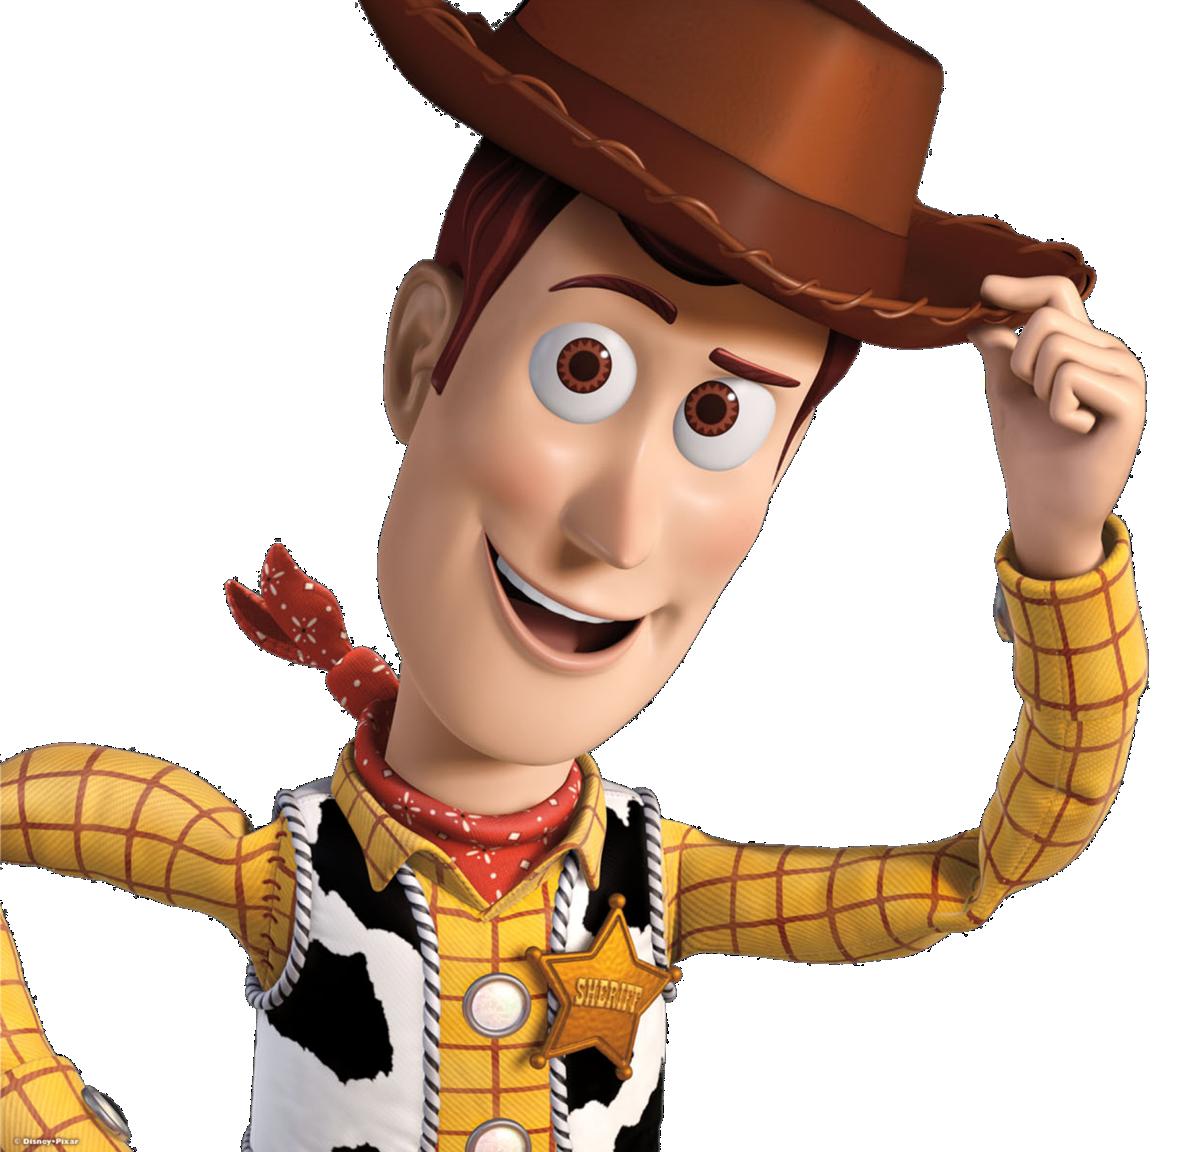 632a20c2ecc1f Woody en imagen para imprimir